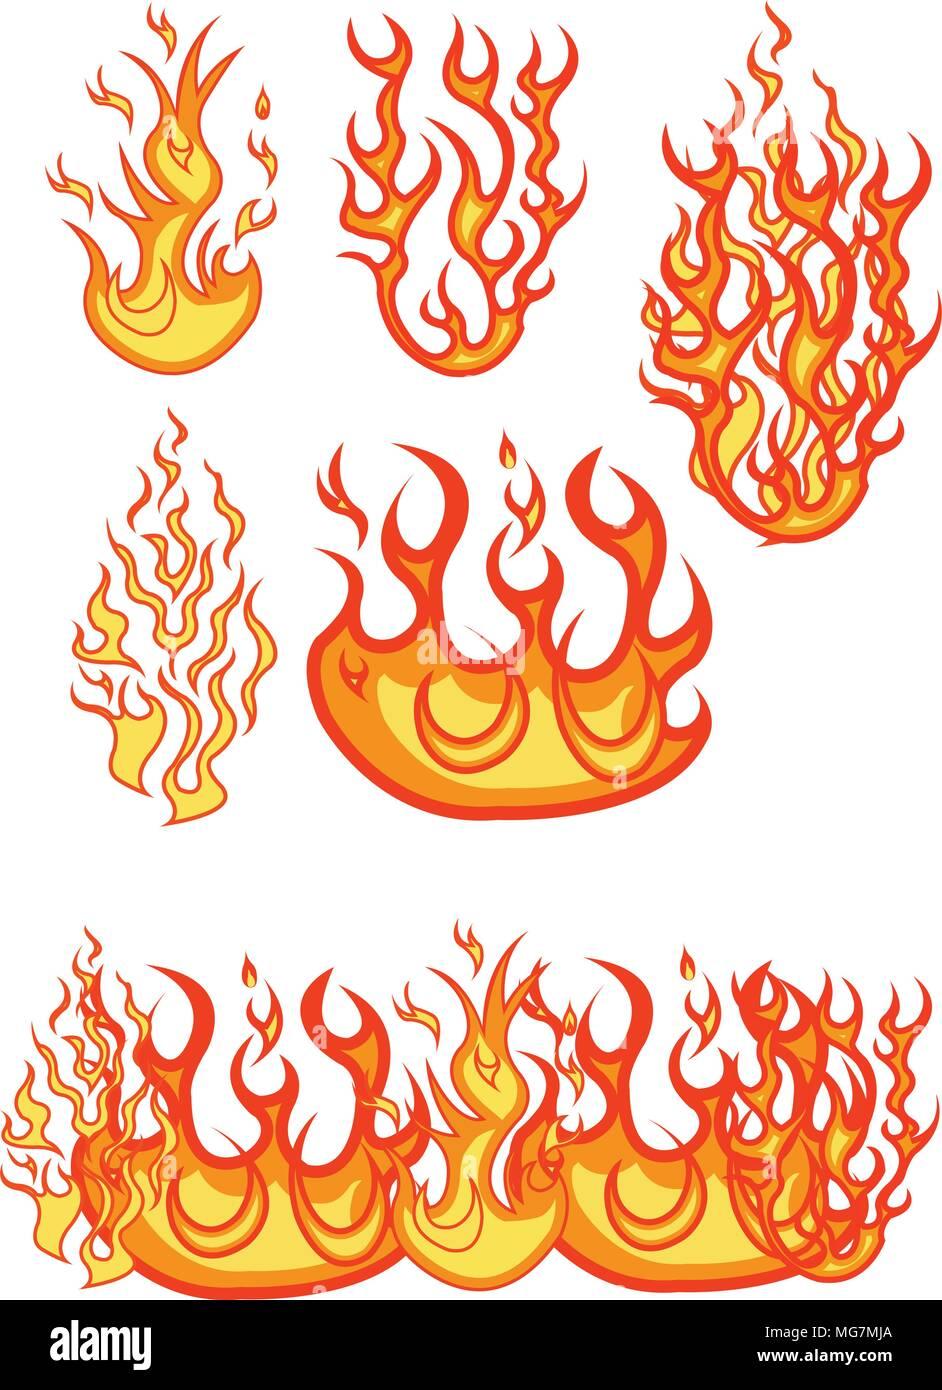 medium resolution of fire svg files fire clipart fire svg file flames cricut files flames silhouette cut file fire png fire cut files eps